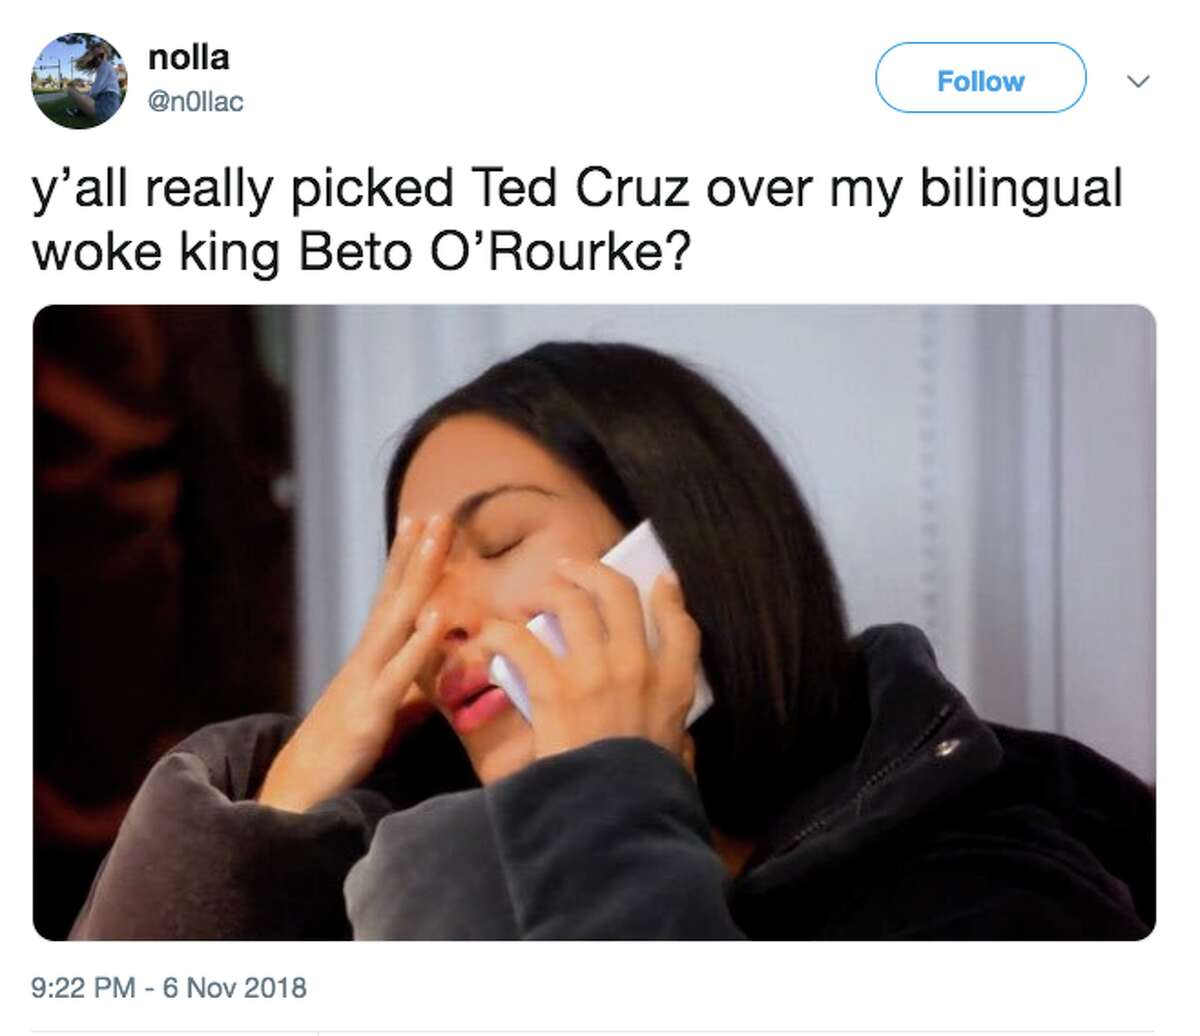 Social media responds to Republican Sen. Ted Cruz defeating Democratic challenger Beto O'Rourke in Texas.